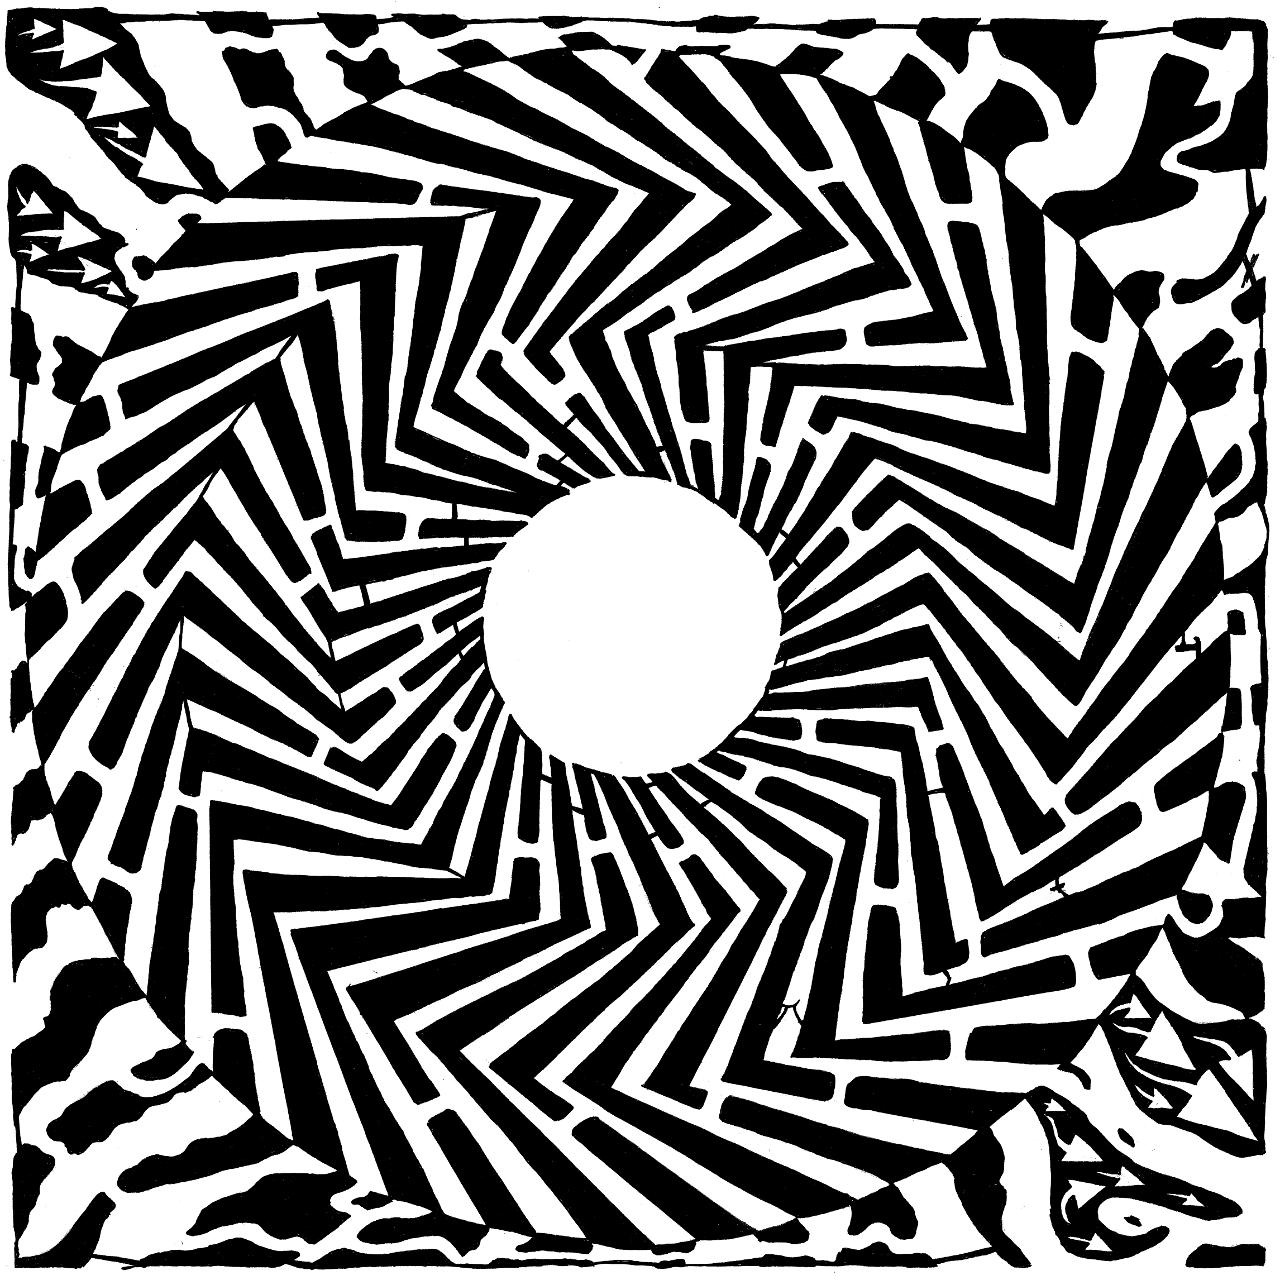 1280x1280 Fractal Optical Illusion